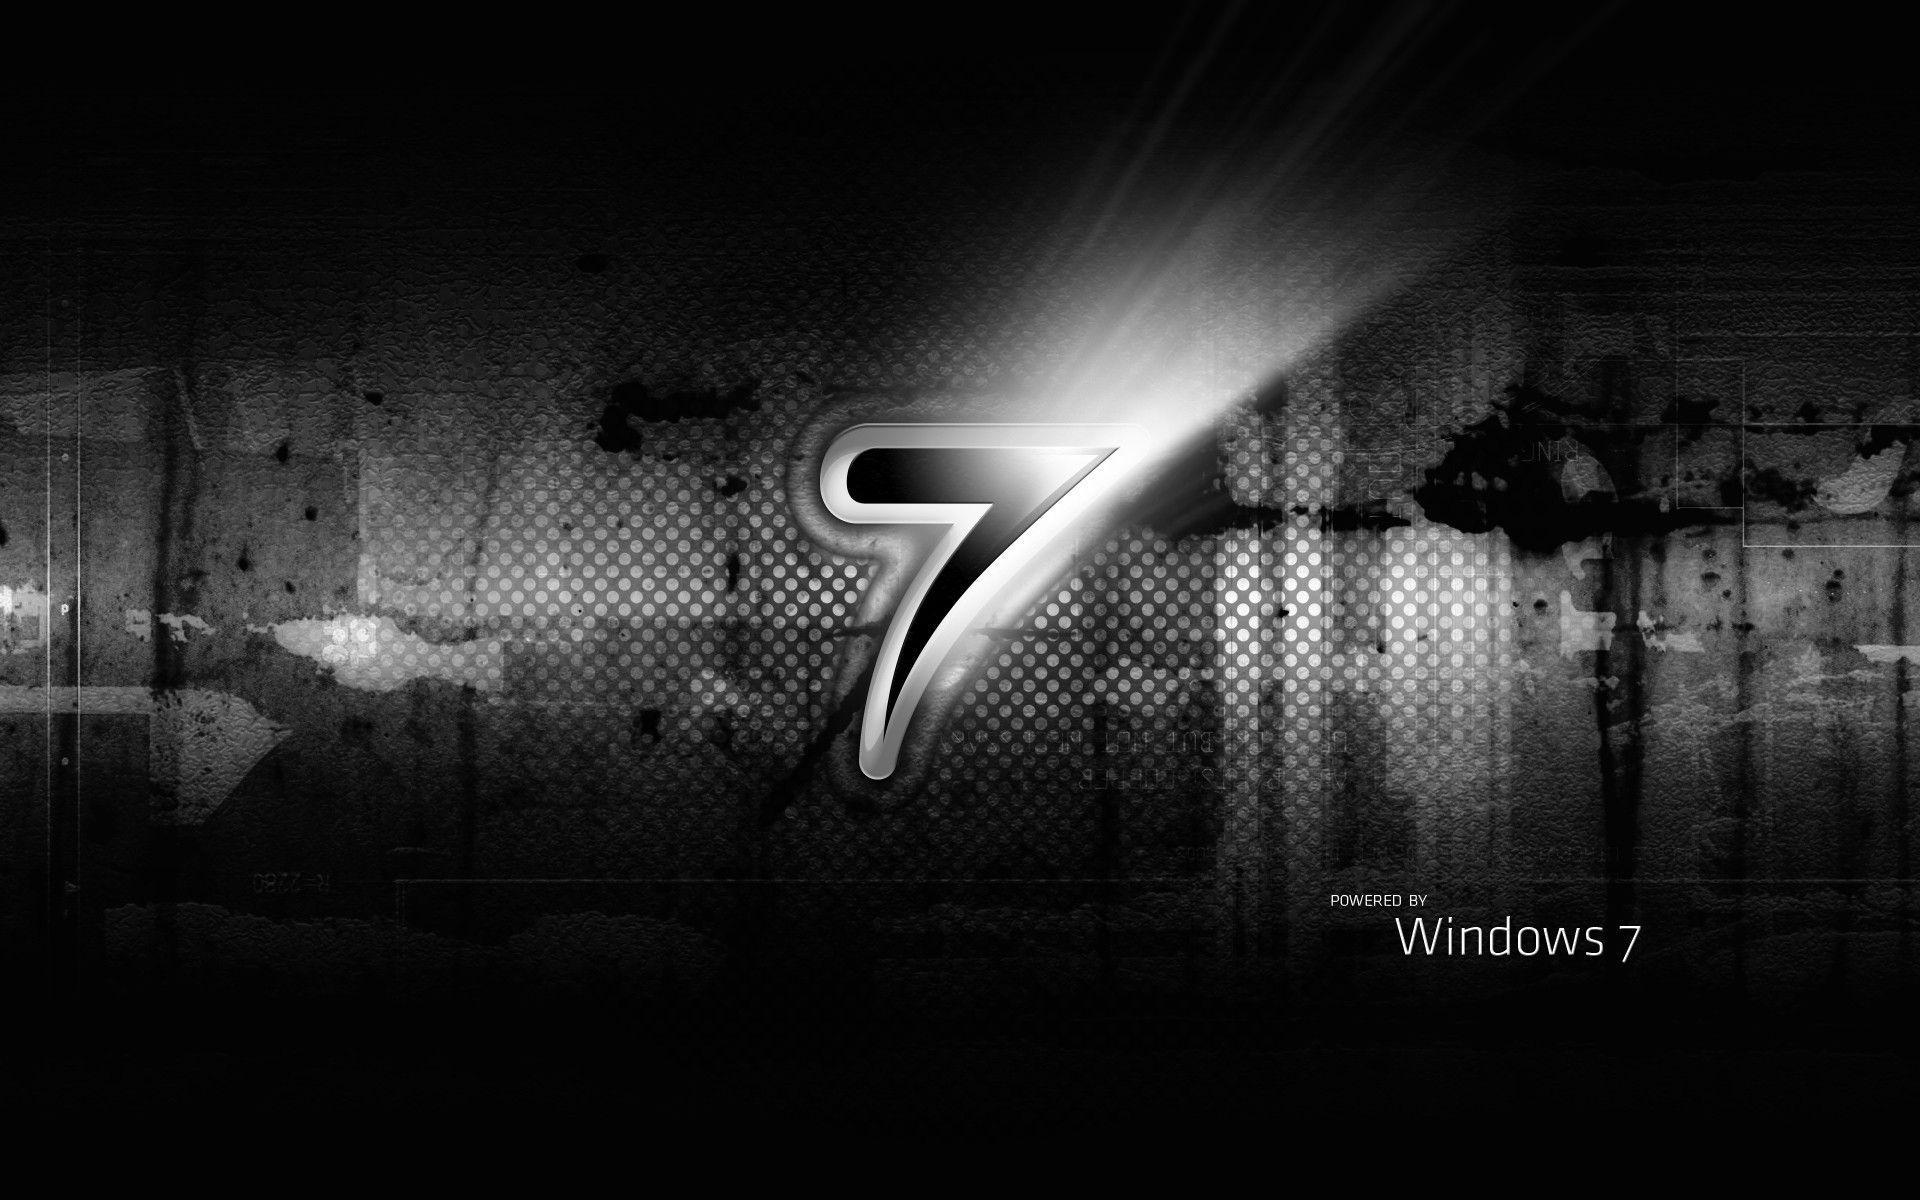 Pubg Wallpapers For Windows 7: Microsoft Windows 7 Desktop Wallpapers